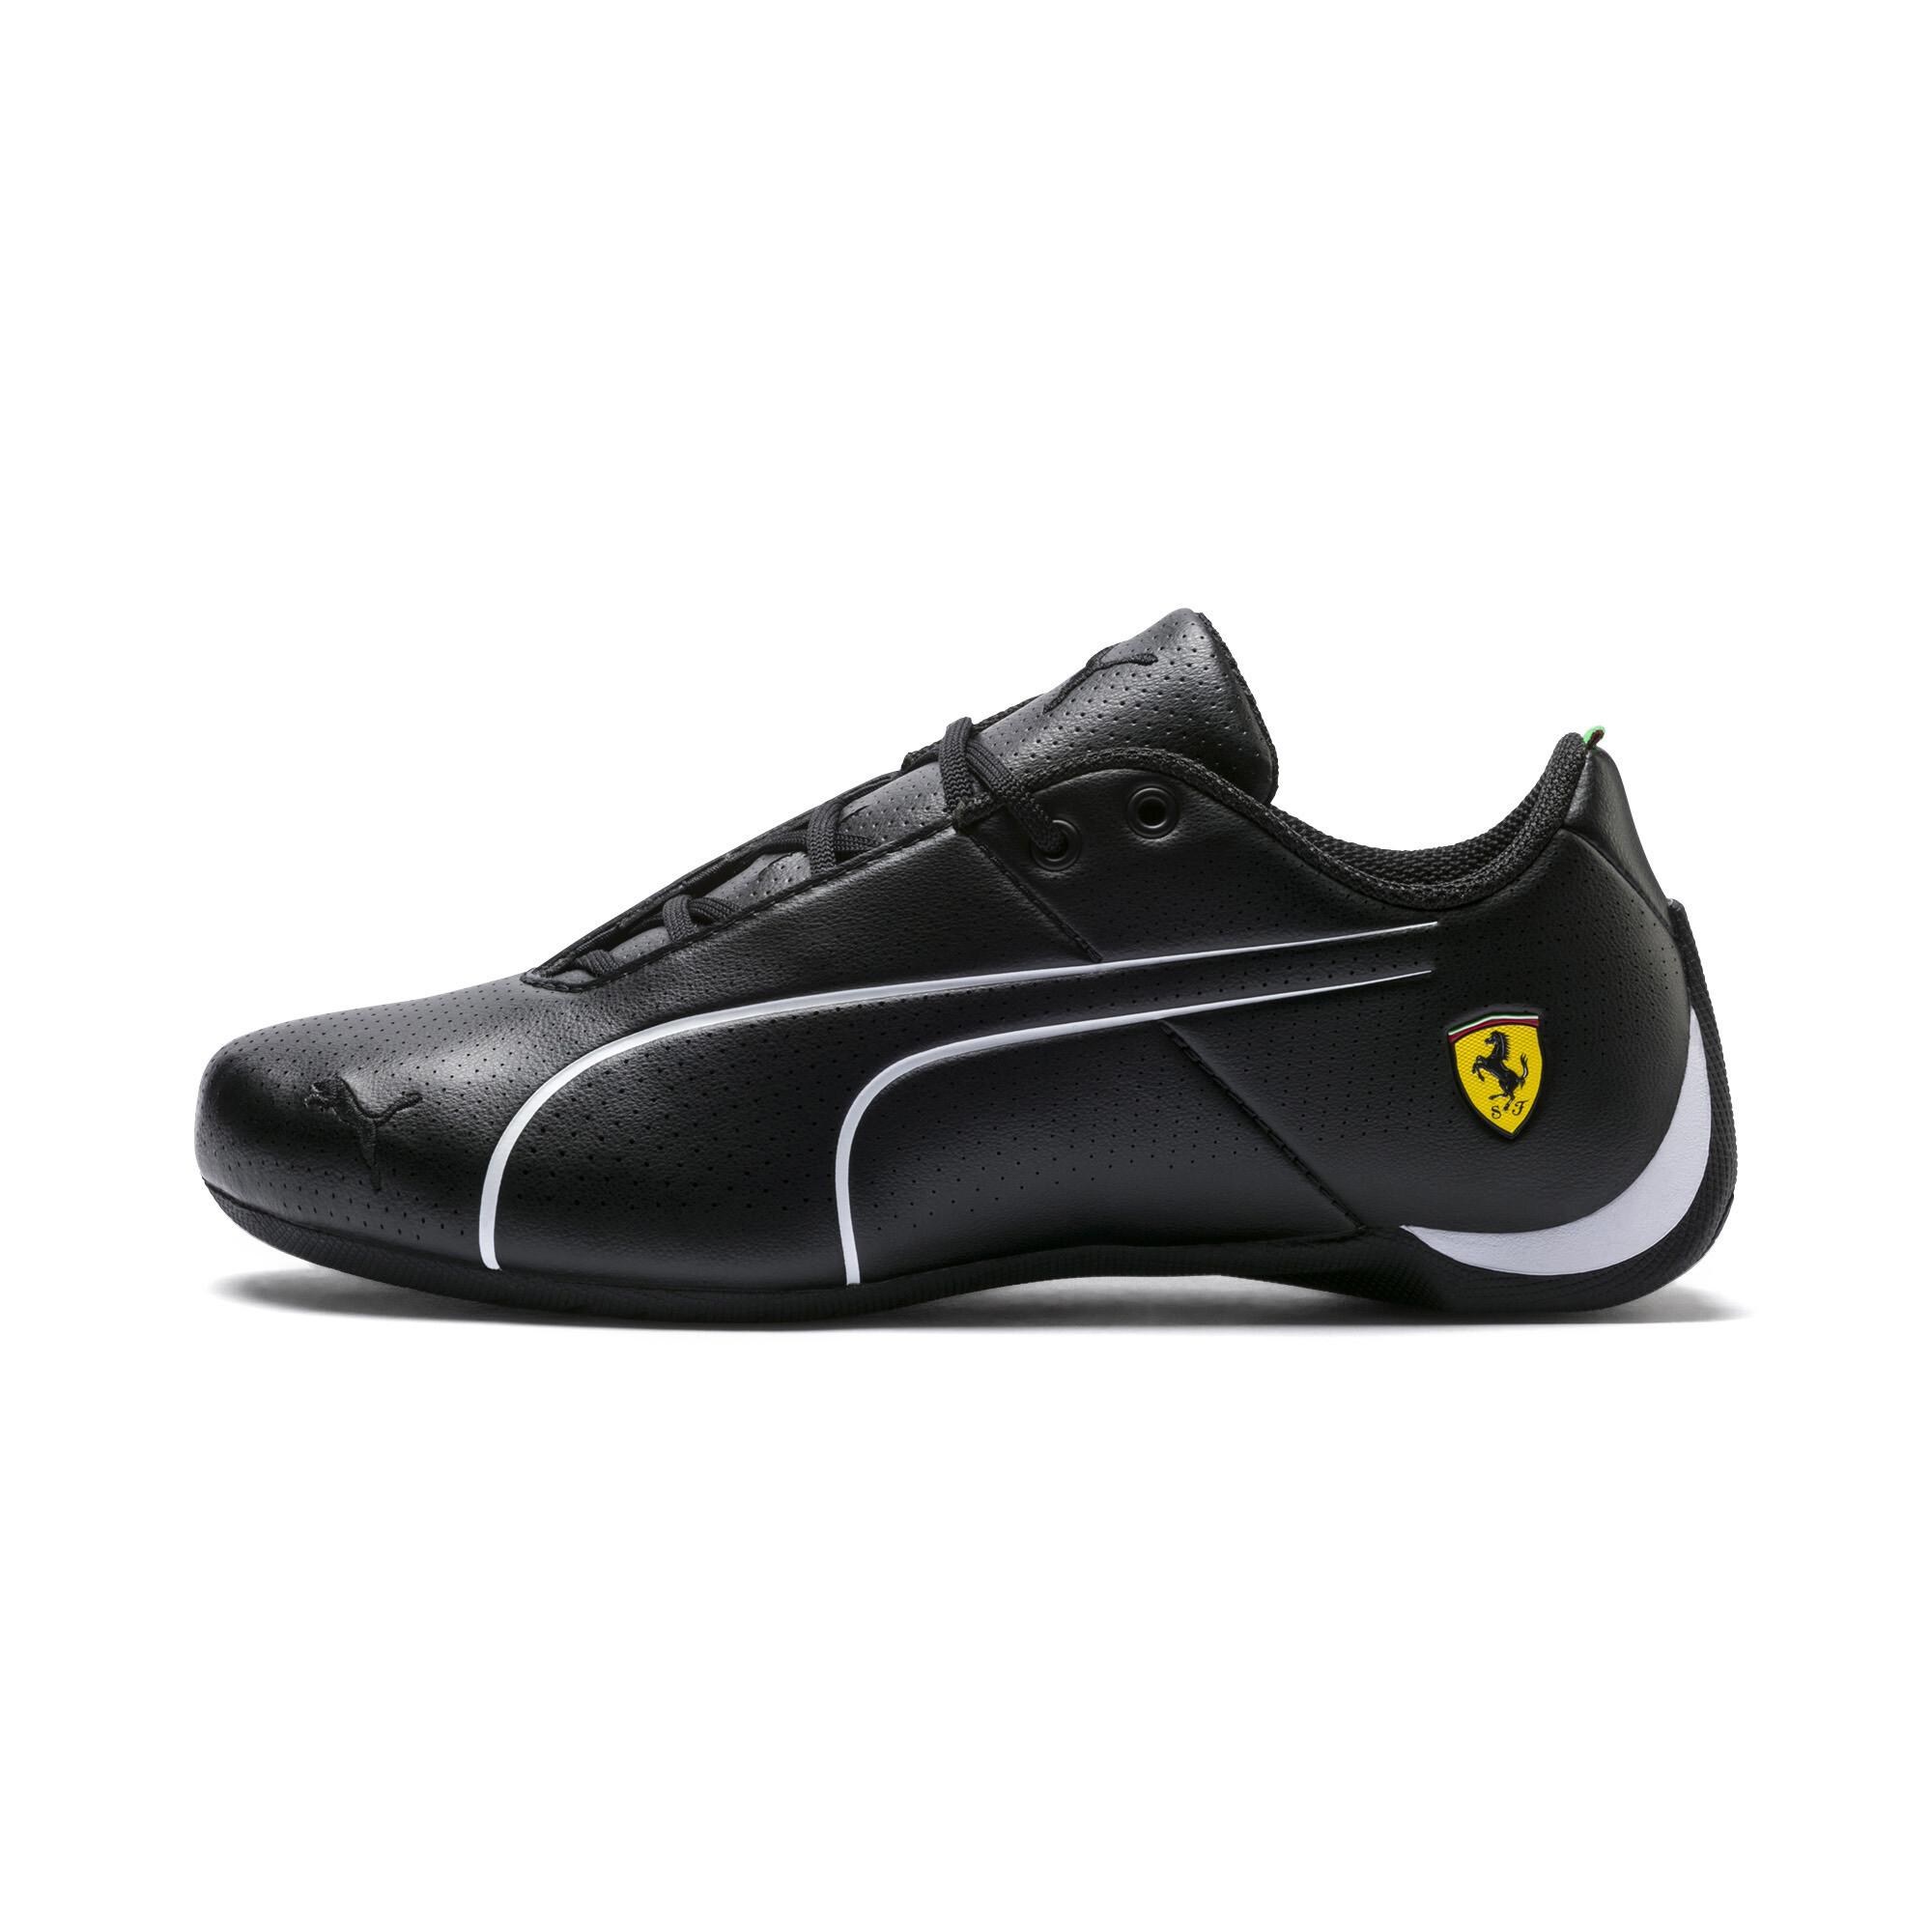 PUMA-Scuderia-Ferrari-Future-Cat-Ultra-Shoes-JR-Kids-Shoe-Auto thumbnail 10